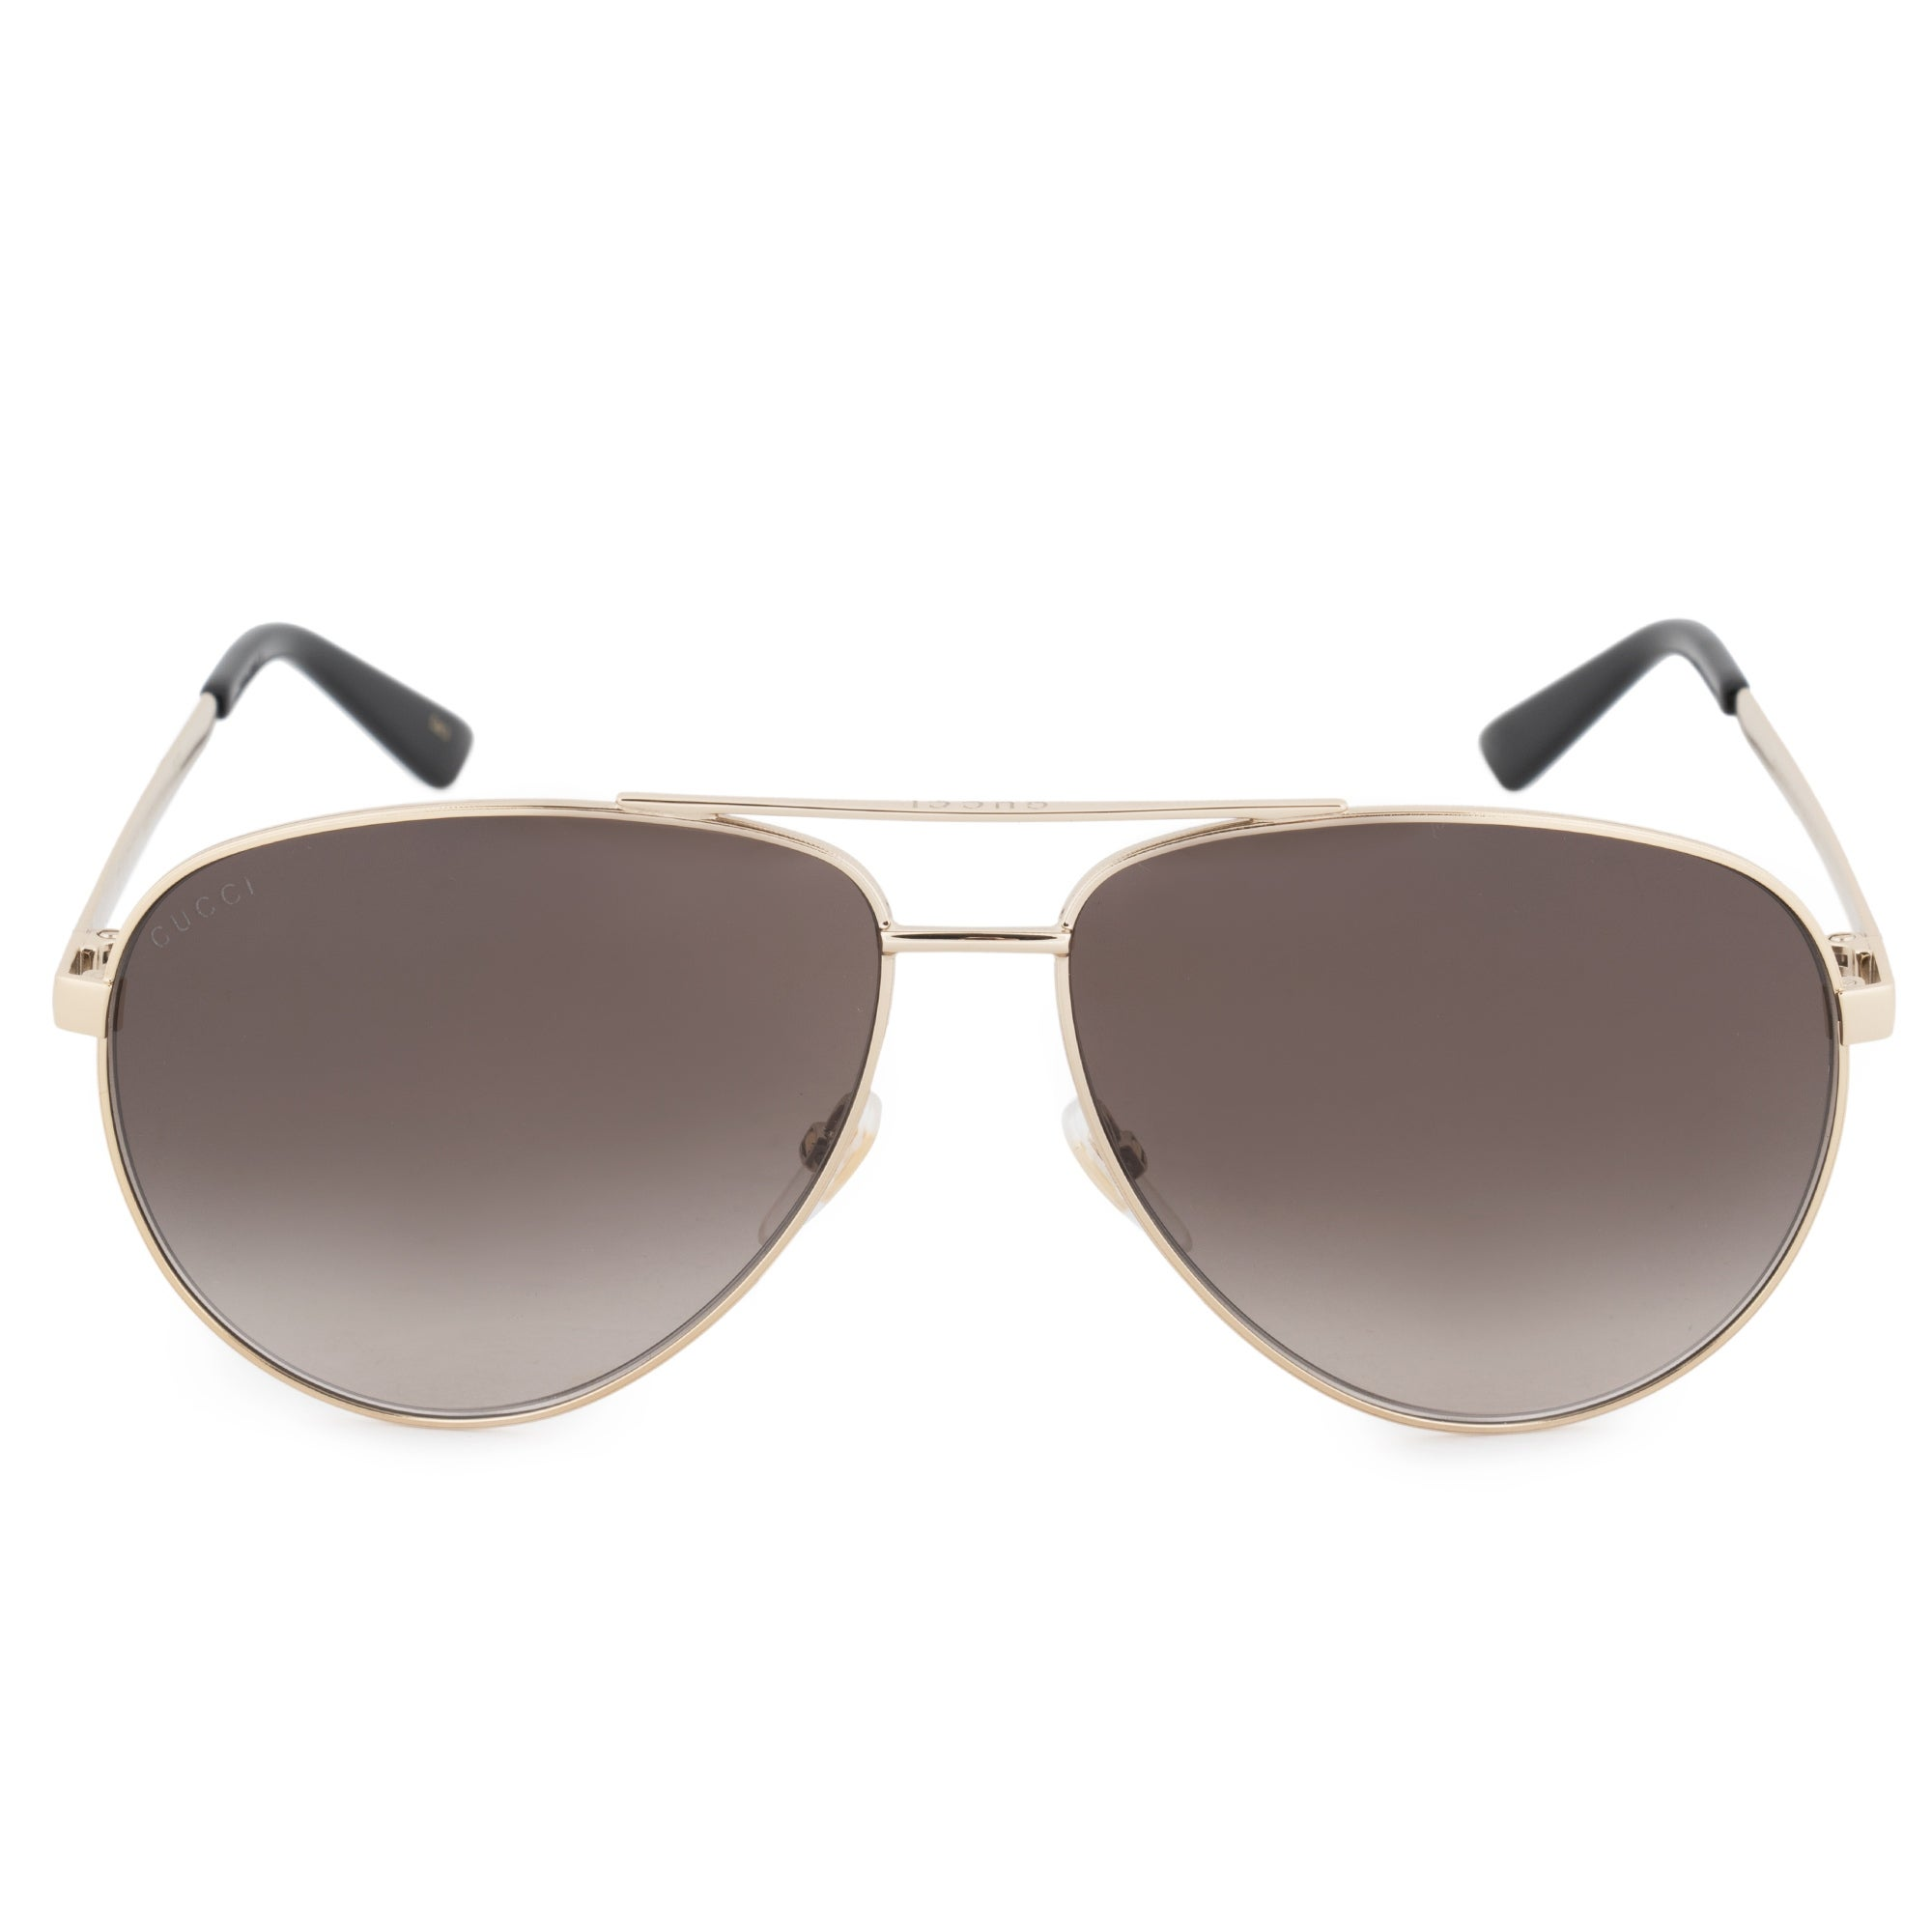 626a406a2 Shop Gucci Gucci Aviator Sunglasses GG0137S 001 61 - Free Shipping ...